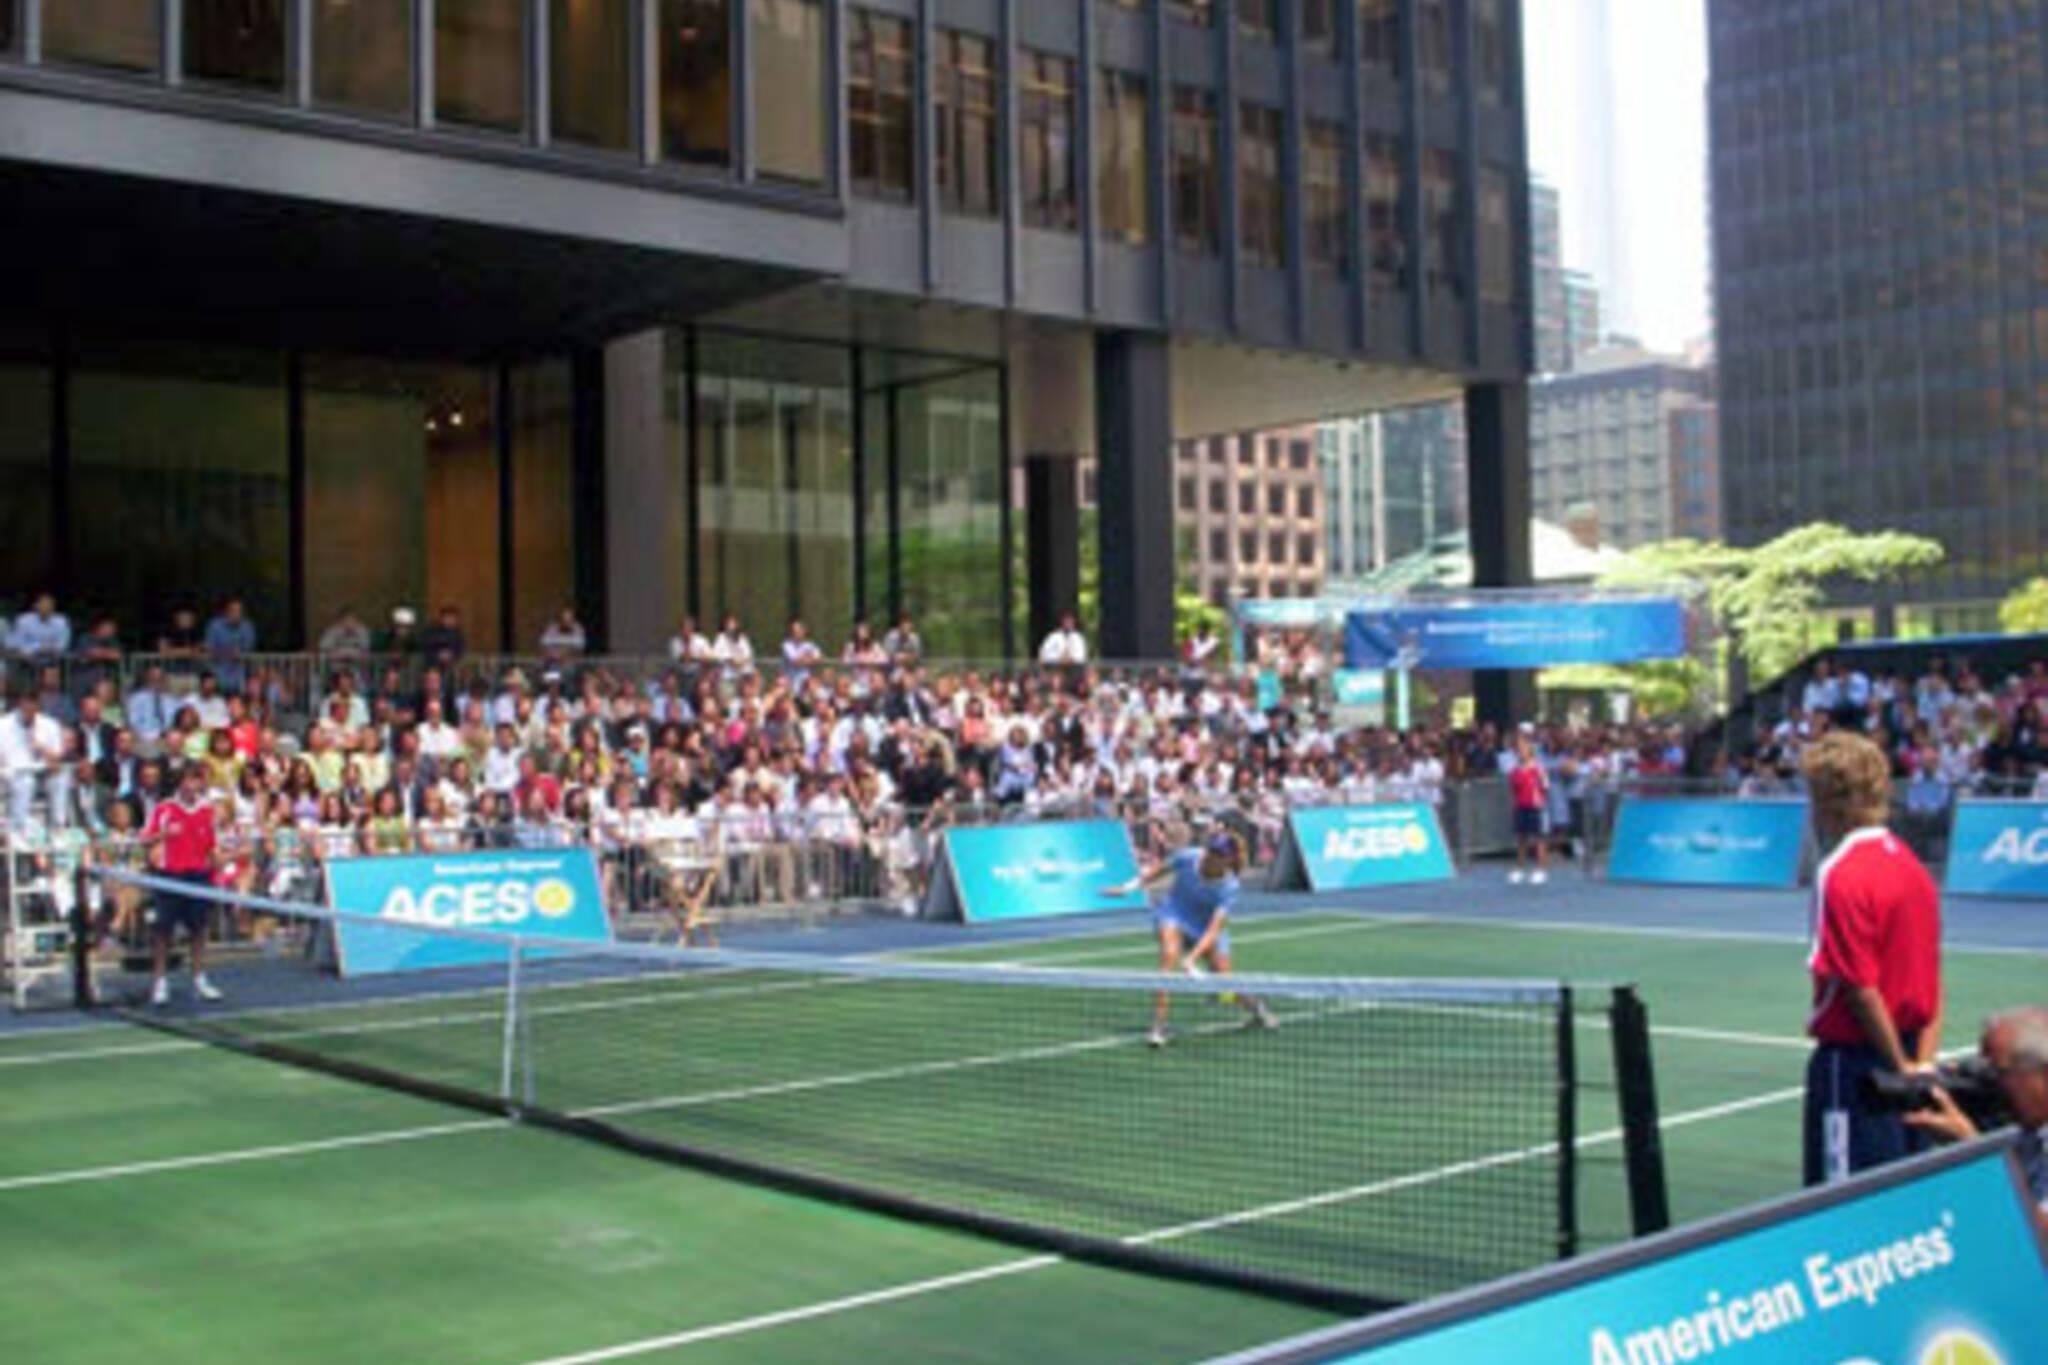 aug1105_tennis_seles1.jpg